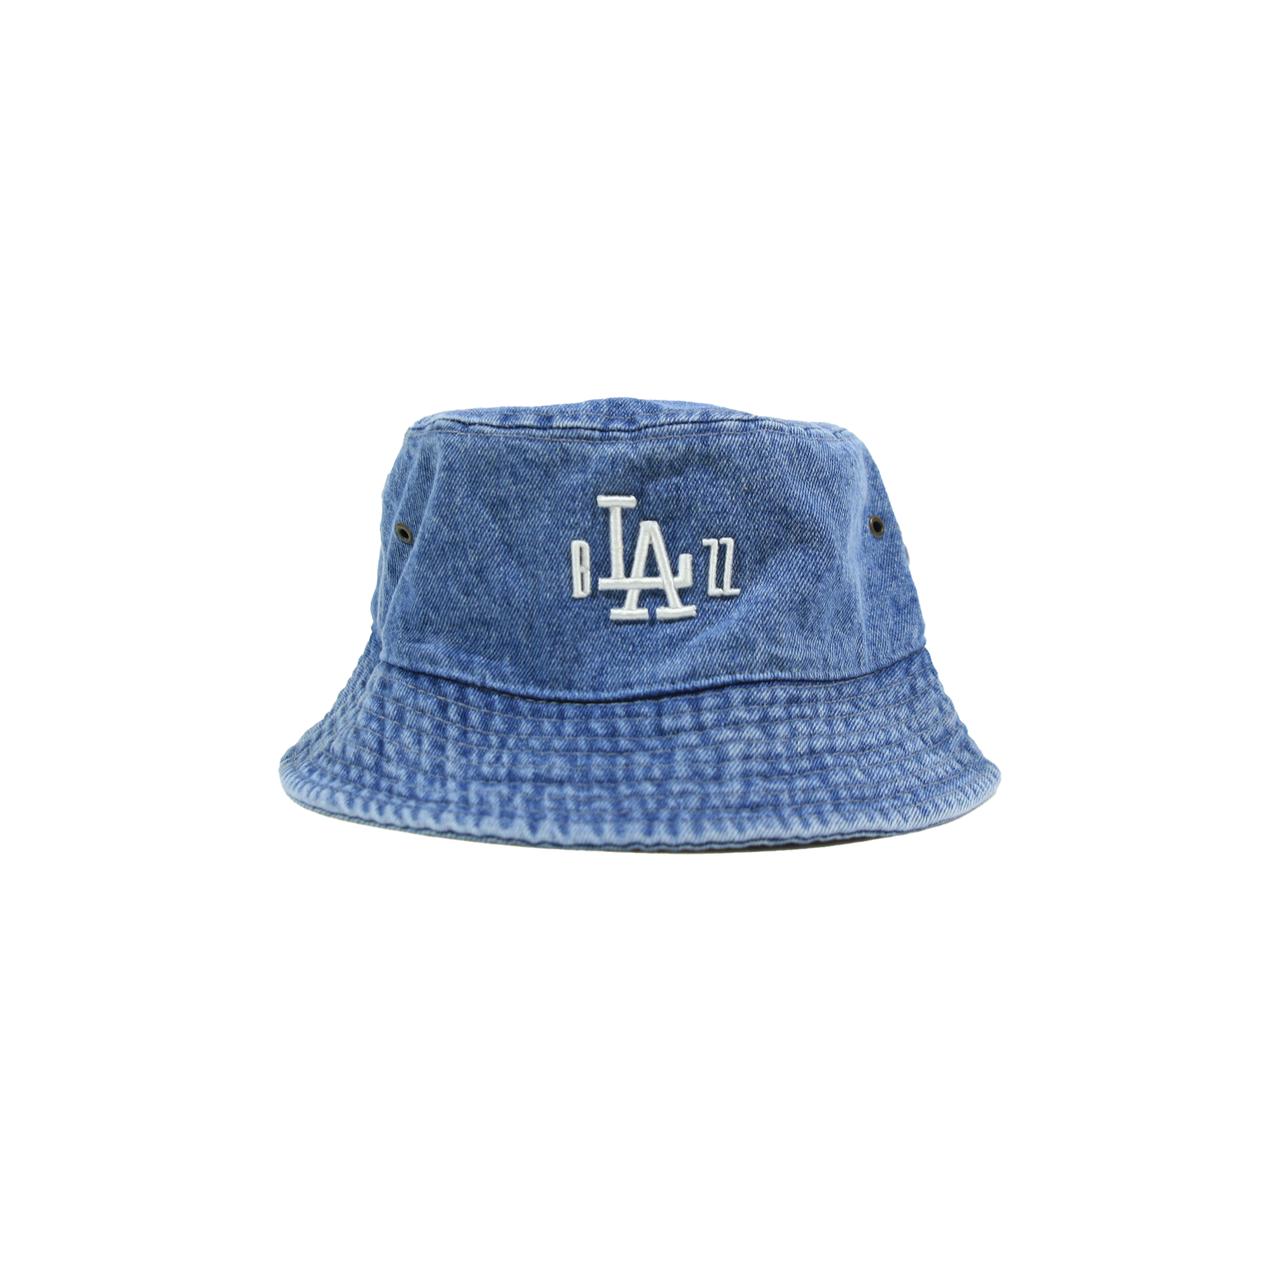 "b""LA""zz 3D DENIM BUCKET HAT [WASHED x WHITE]"